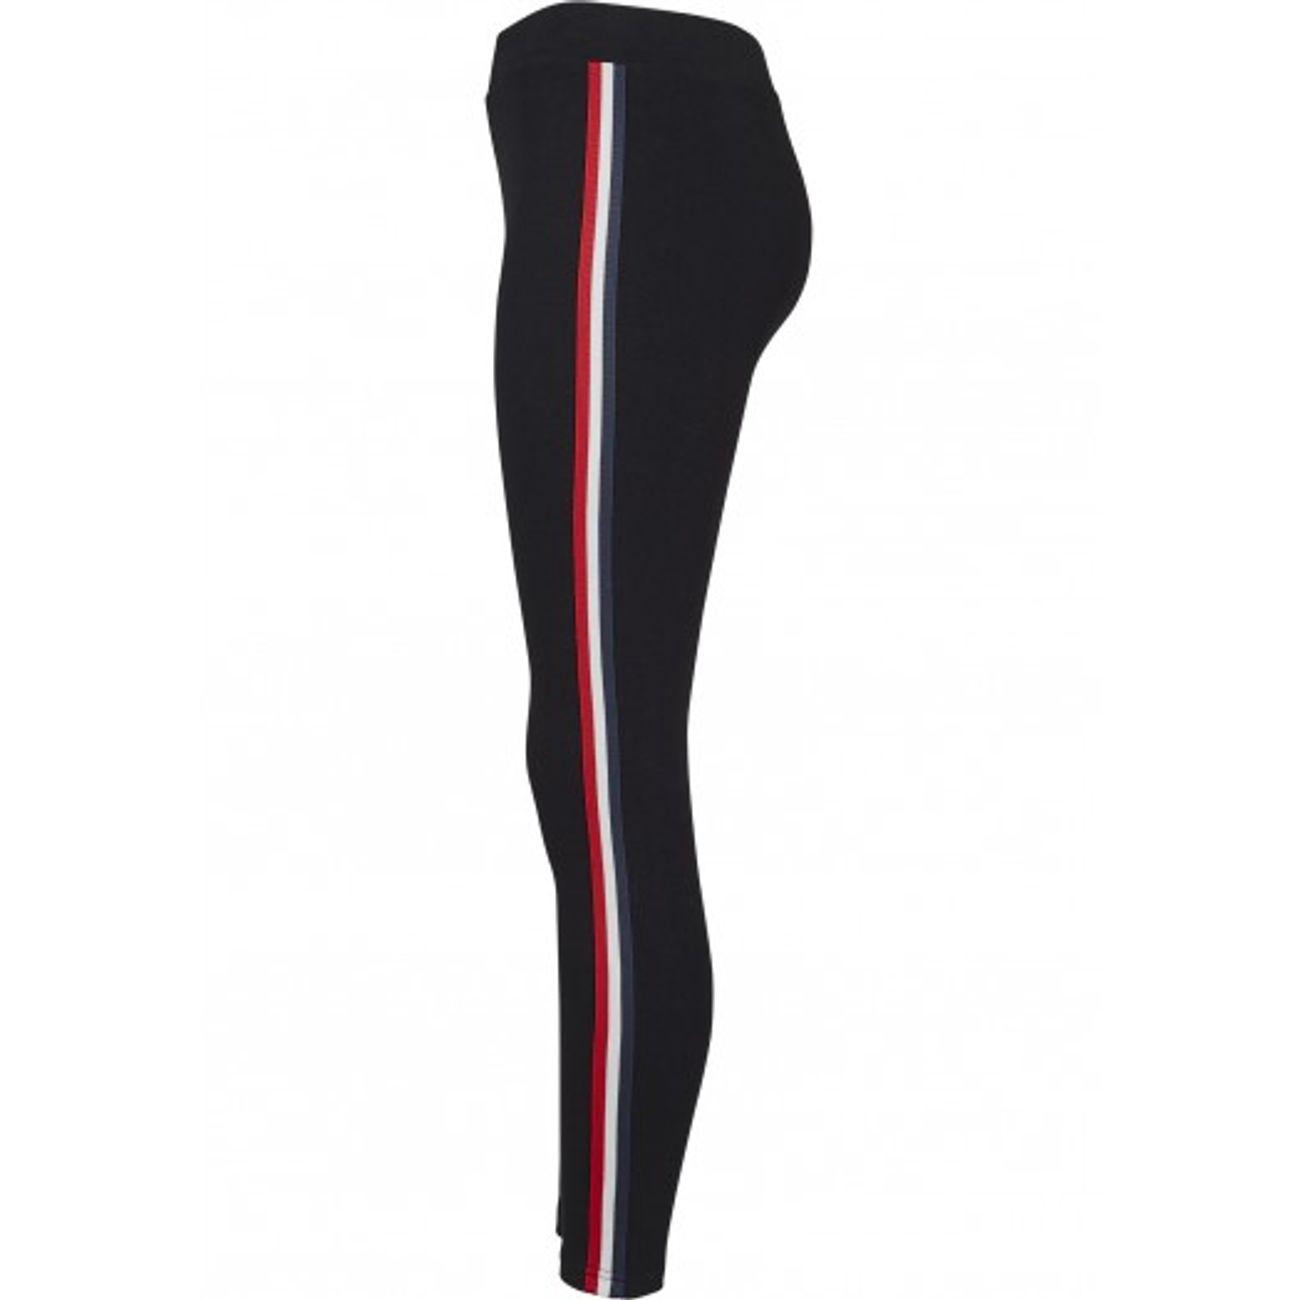 Mode- Lifestyle femme URBAN CLASSICS Legging rétro avec bande bicolore